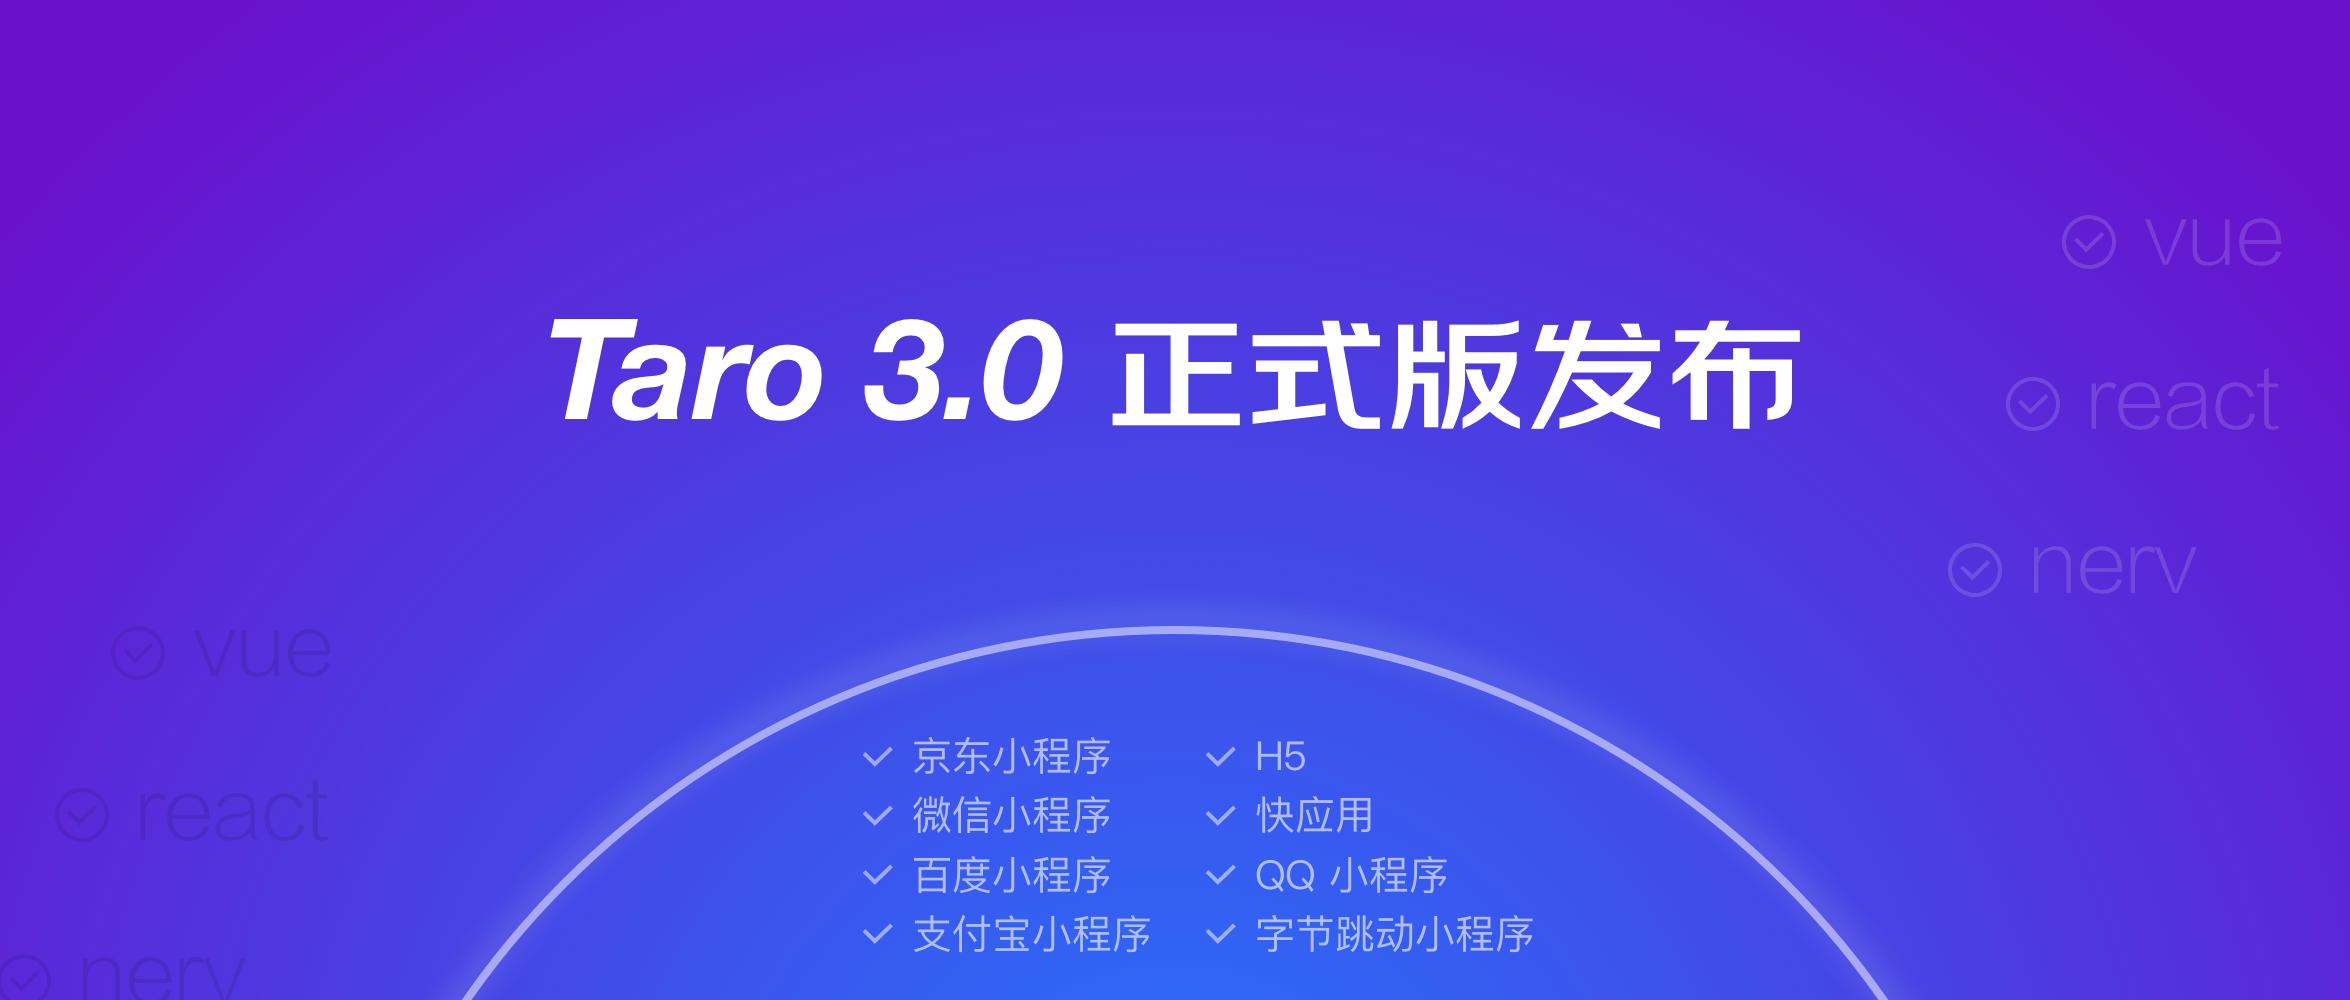 Taro 3 正式版发布:开放式跨端跨框架解决方案